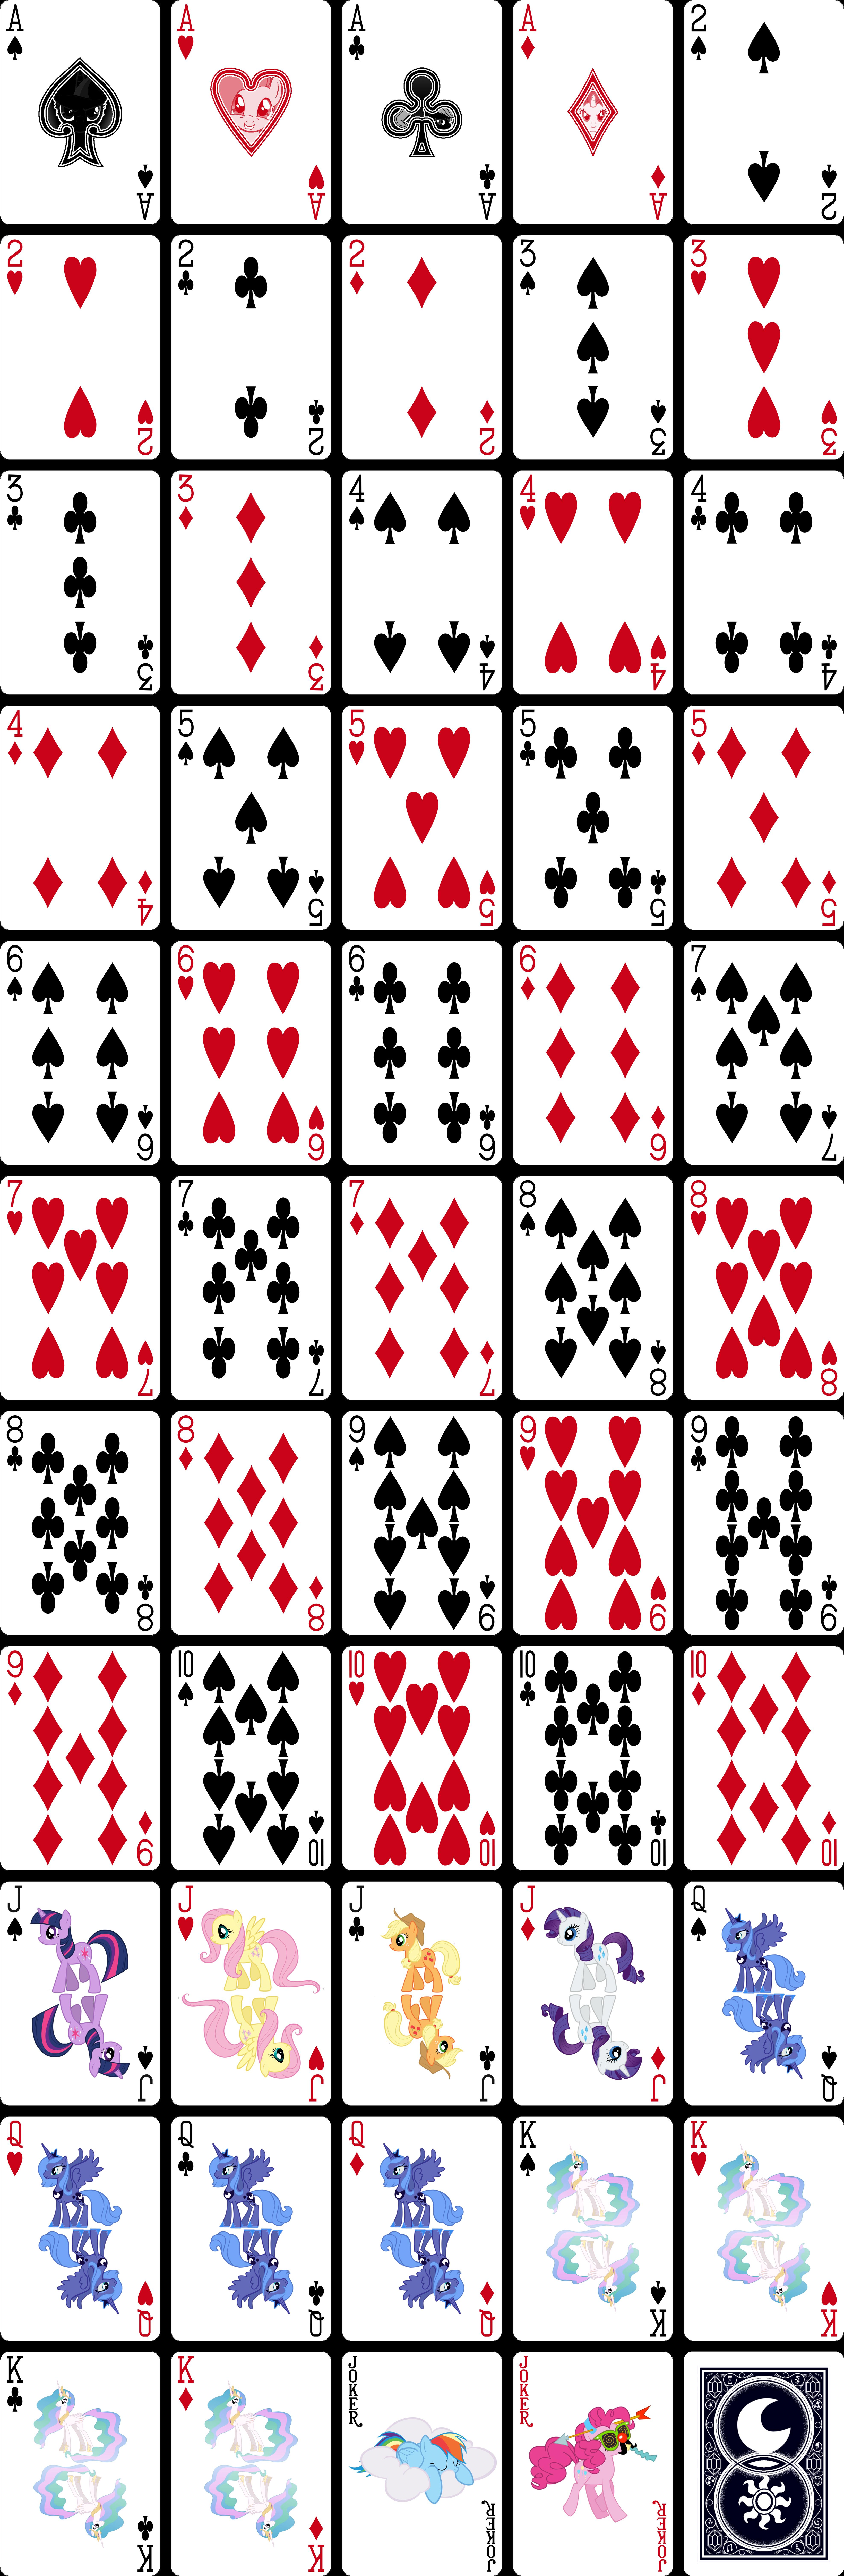 My little pony poker cards